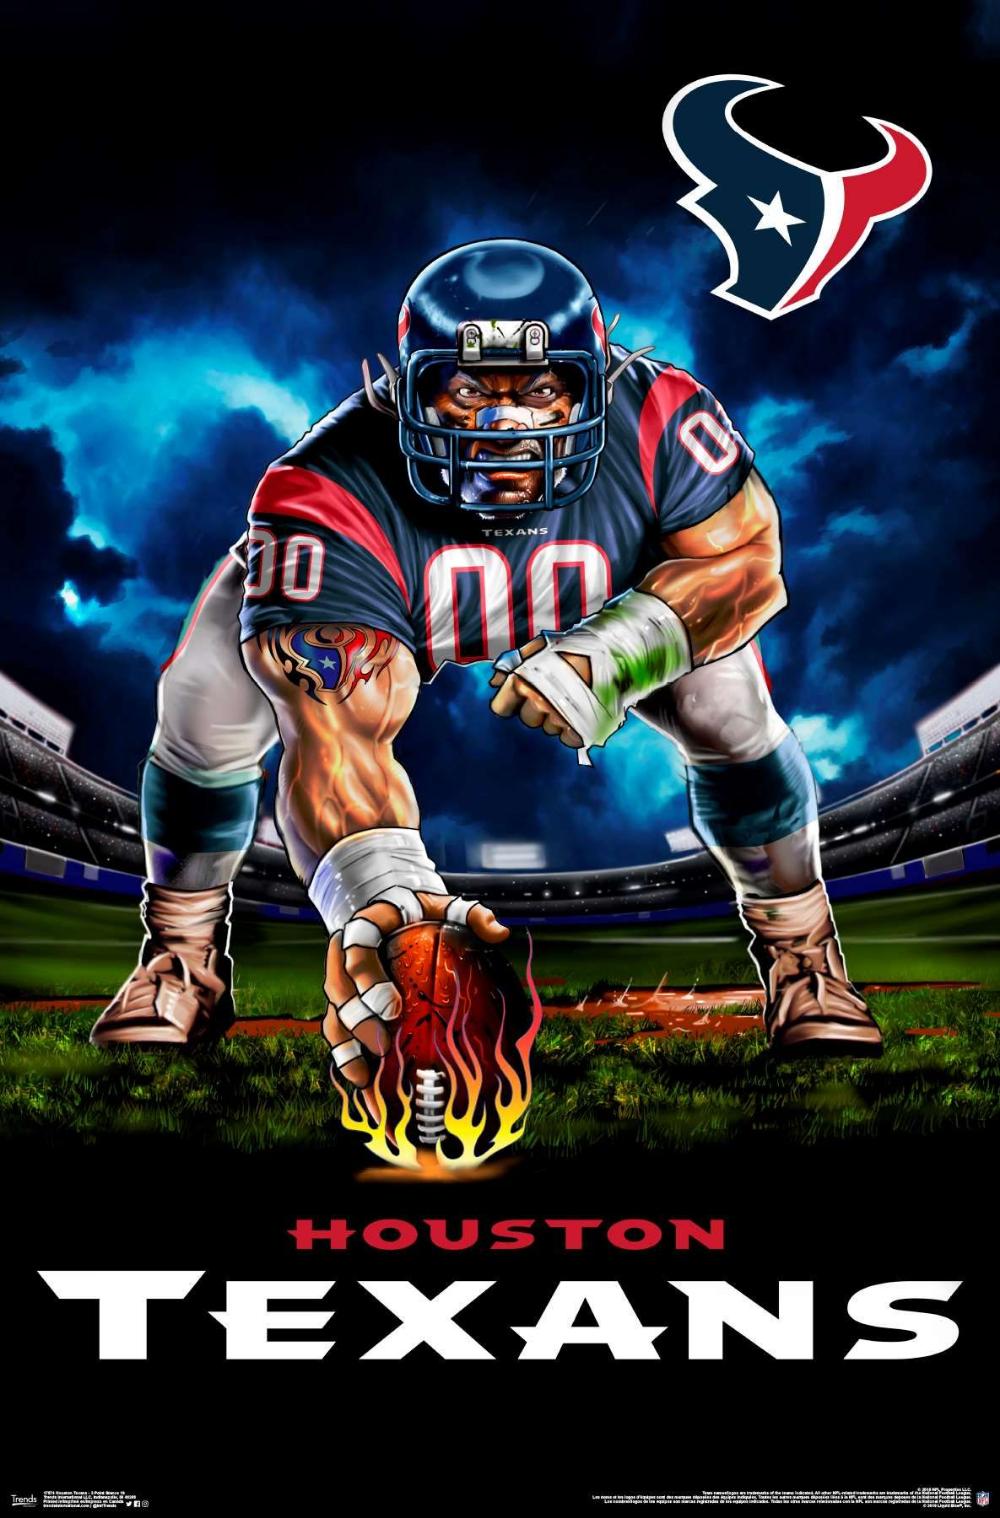 Nfl Houston Texans 3 Point Stance Houston Texans Football Logo